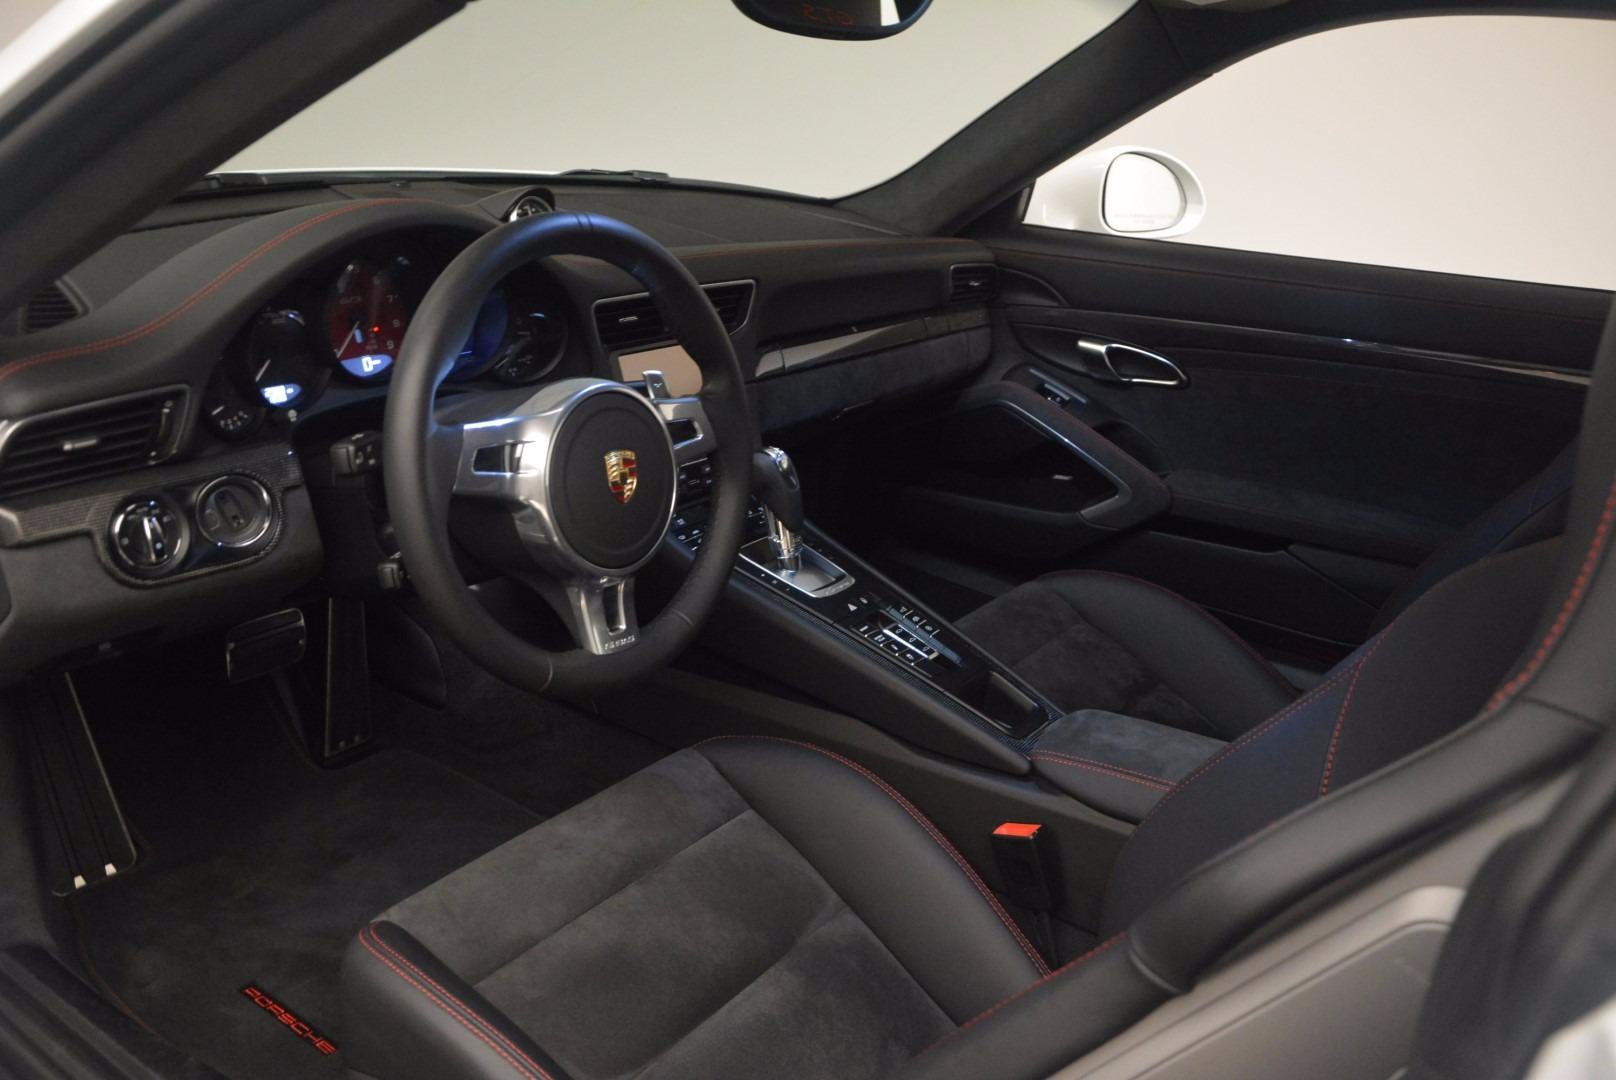 Used 2015 Porsche 911 Carrera GTS For Sale In Greenwich, CT 1444_p17